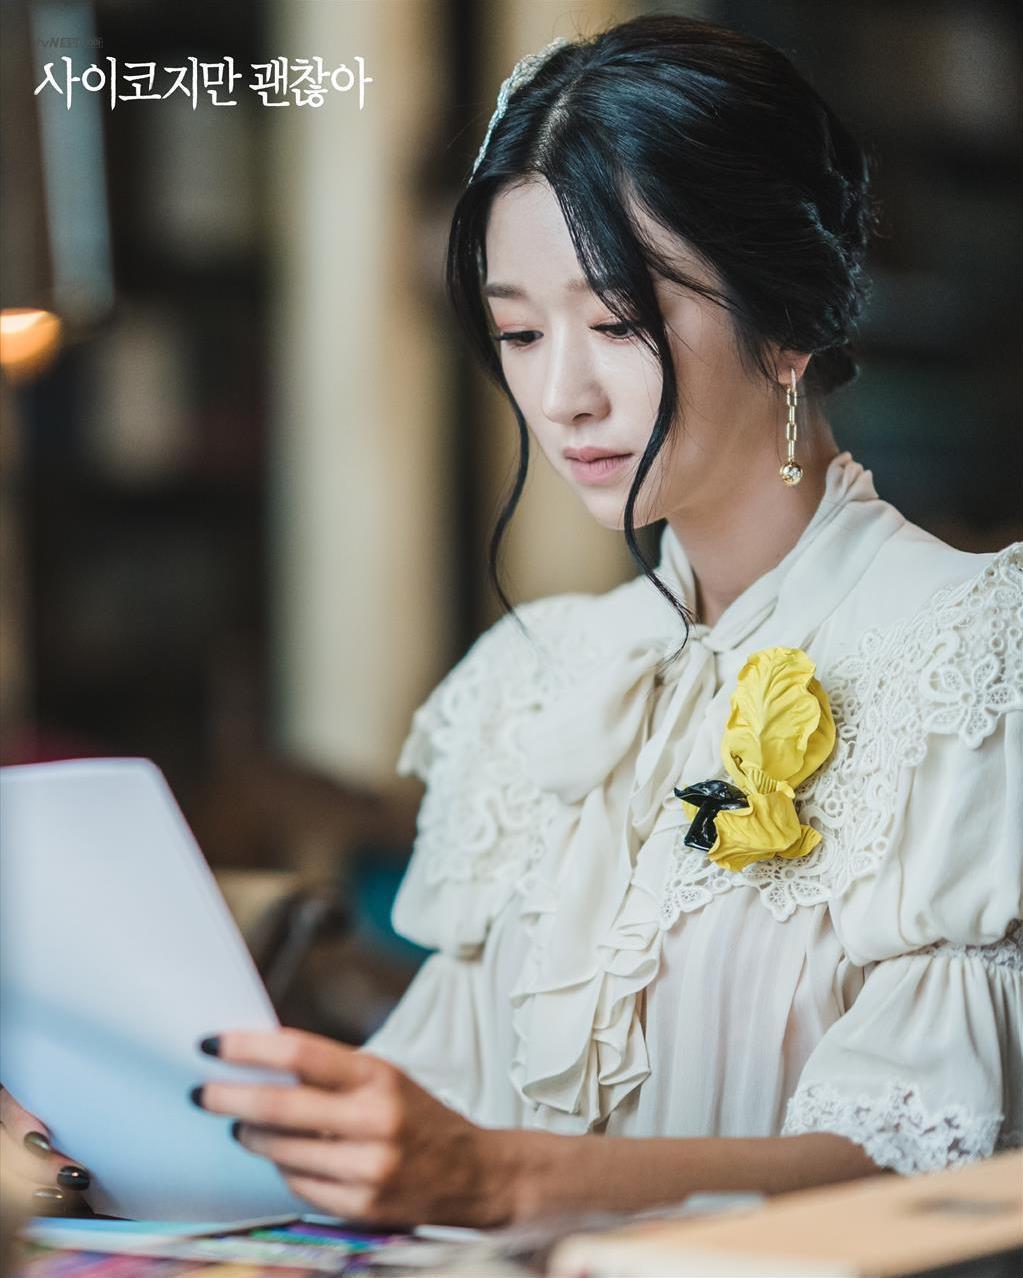 Seo Ye-Ji in It's Okay to Not Be Okay (2020)